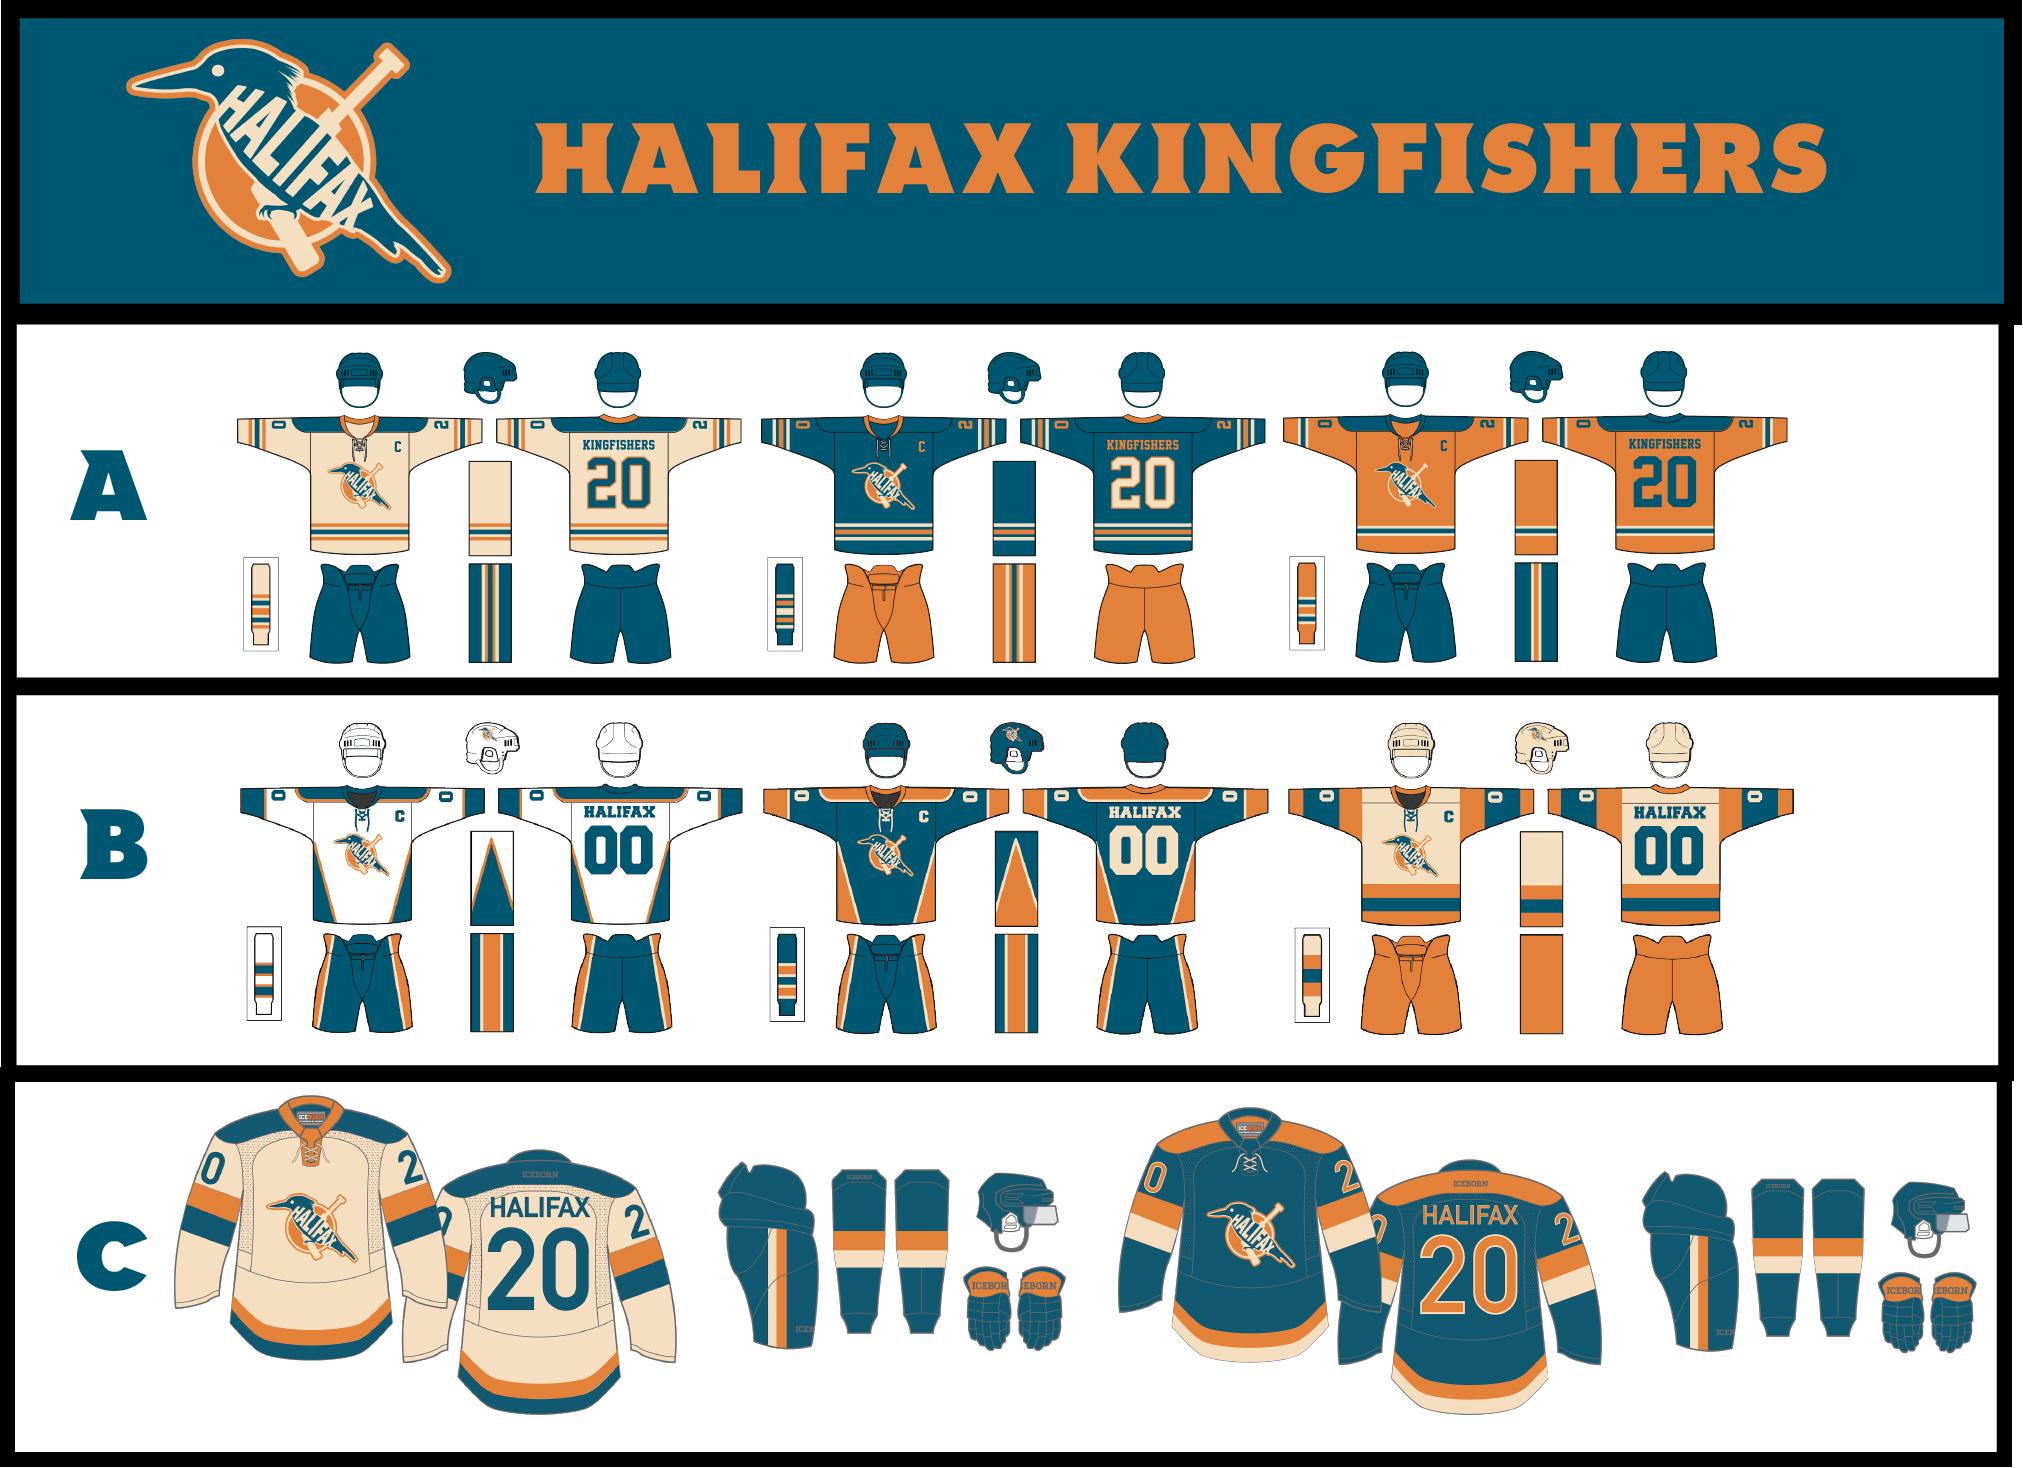 https://i.ibb.co/W3MLbct/Halifax-Kingfishers-Jerseys.png